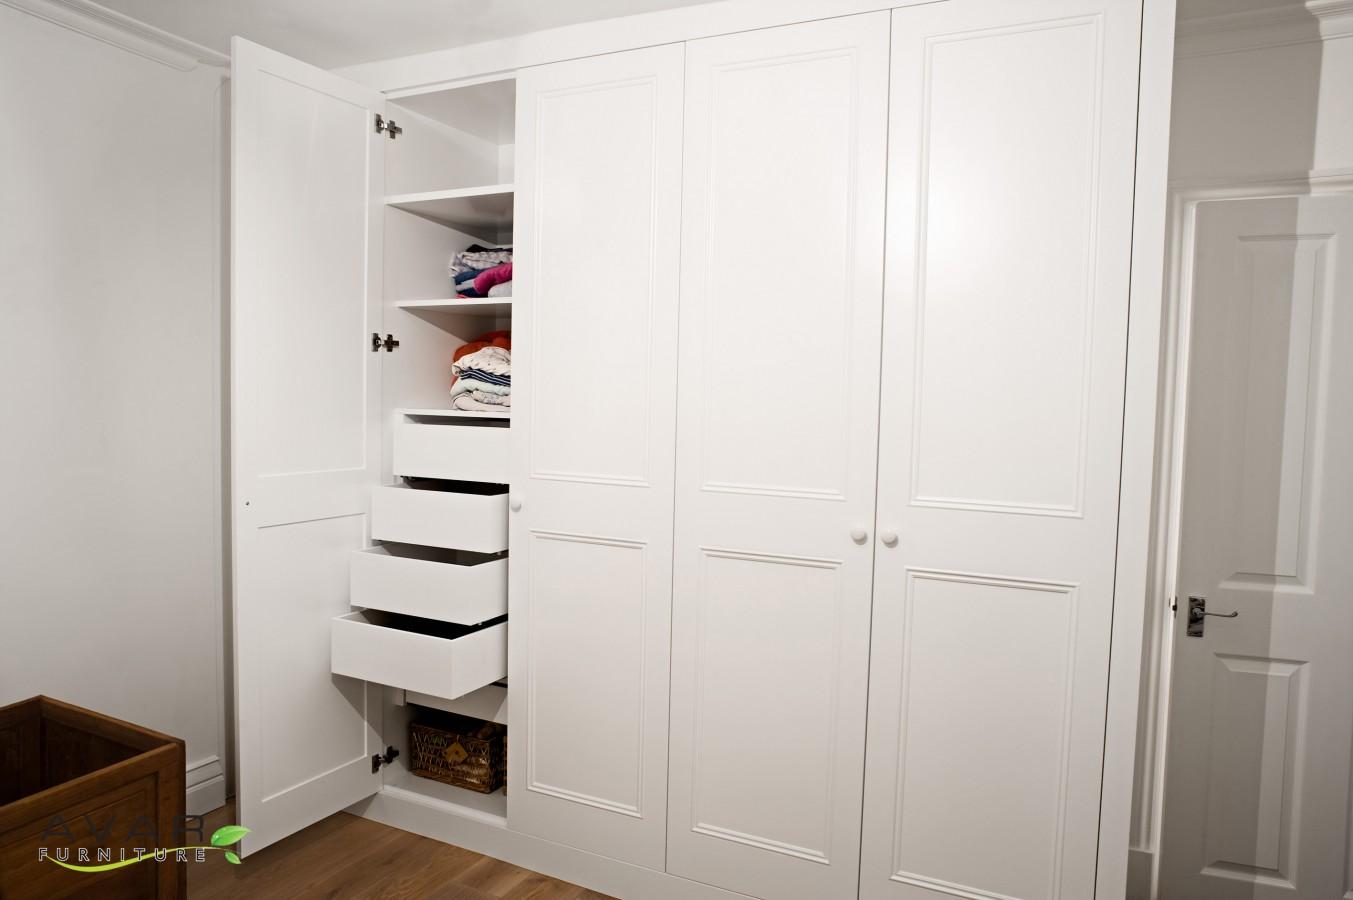 Fitted wardrobe ideas gallery 3 north london uk avar furniture - Fitted Wardrobe Ideas Gallery 22 North London Uk